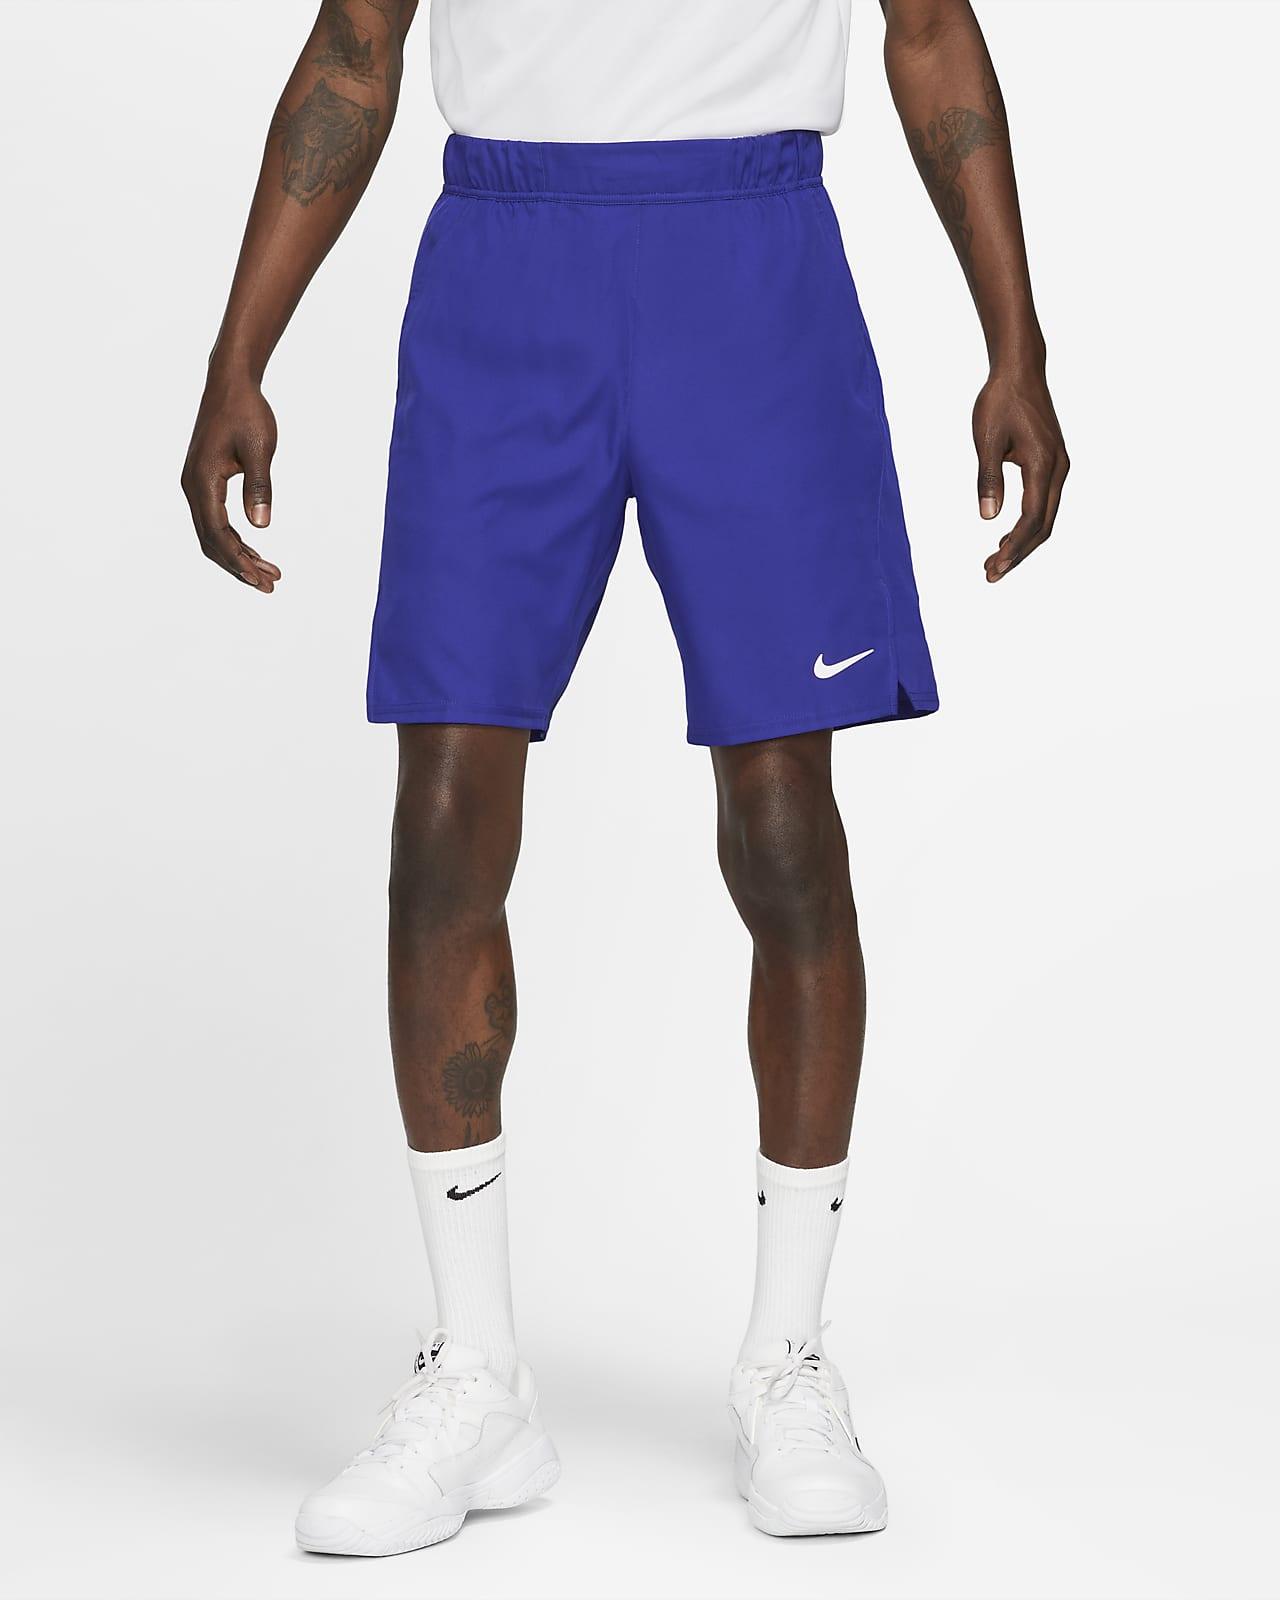 NikeCourt Dri-FIT Victory Men's 23cm (approx.) Tennis Shorts